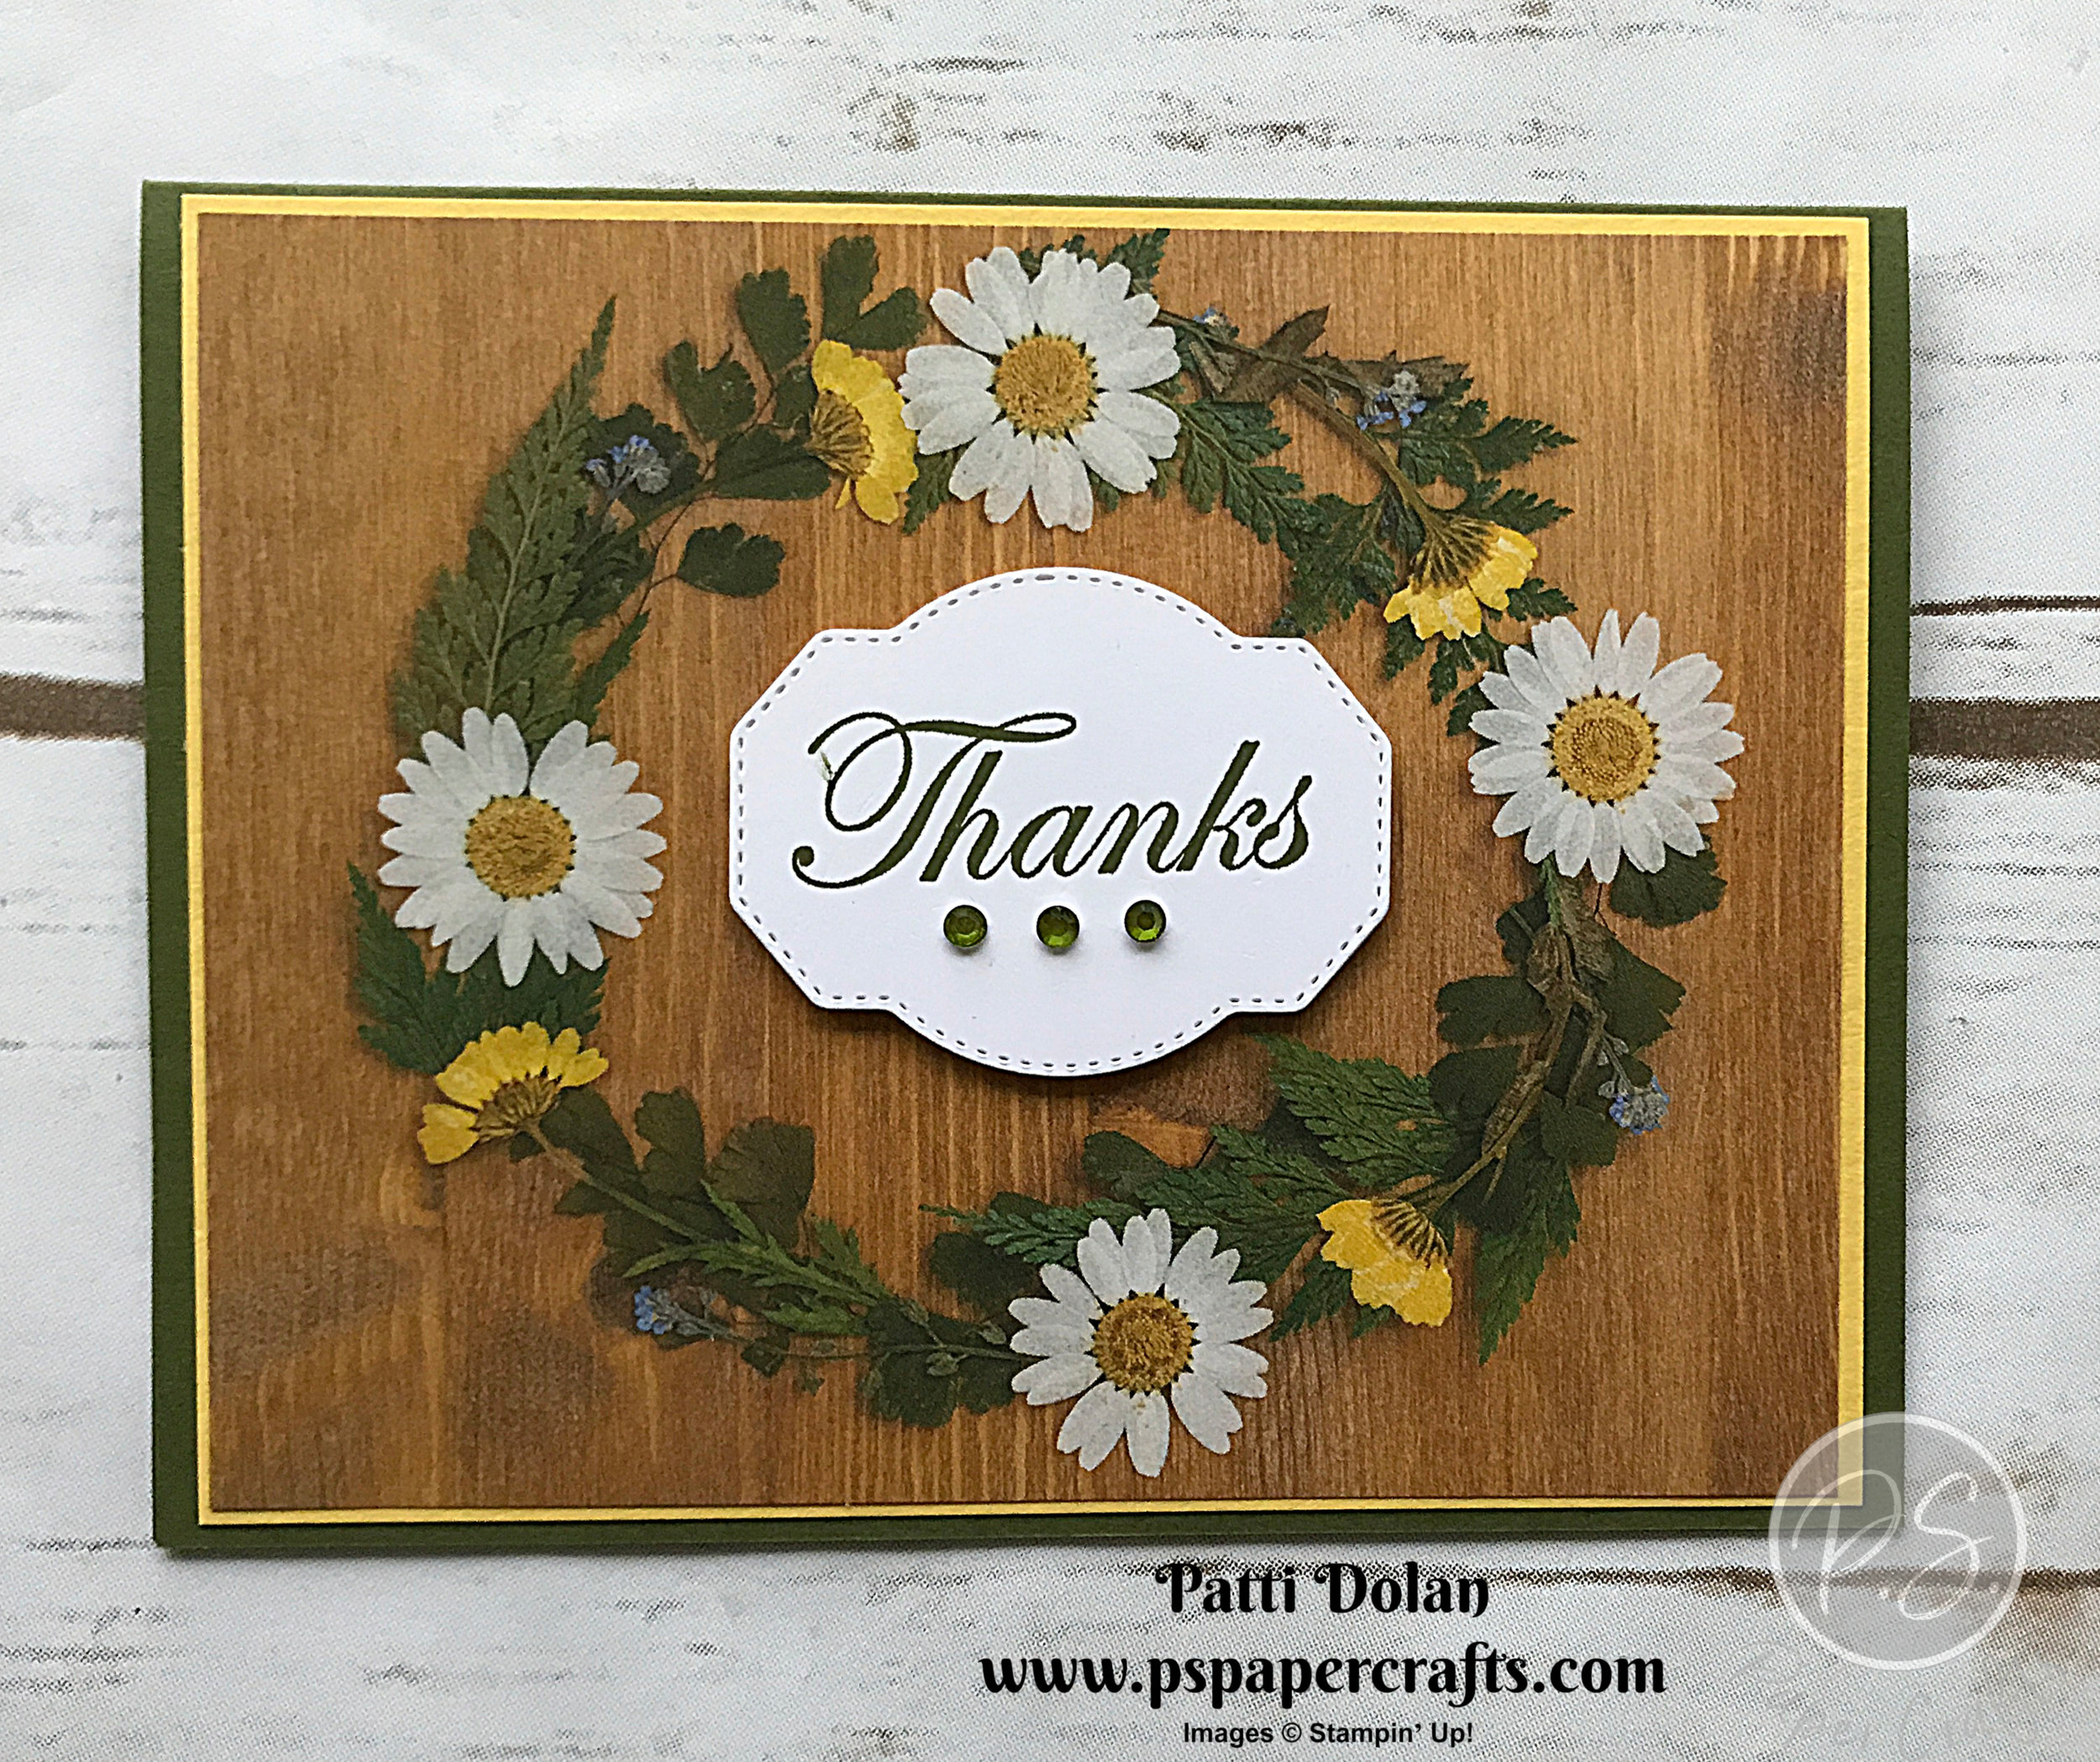 Pressed Petals card7.jpg